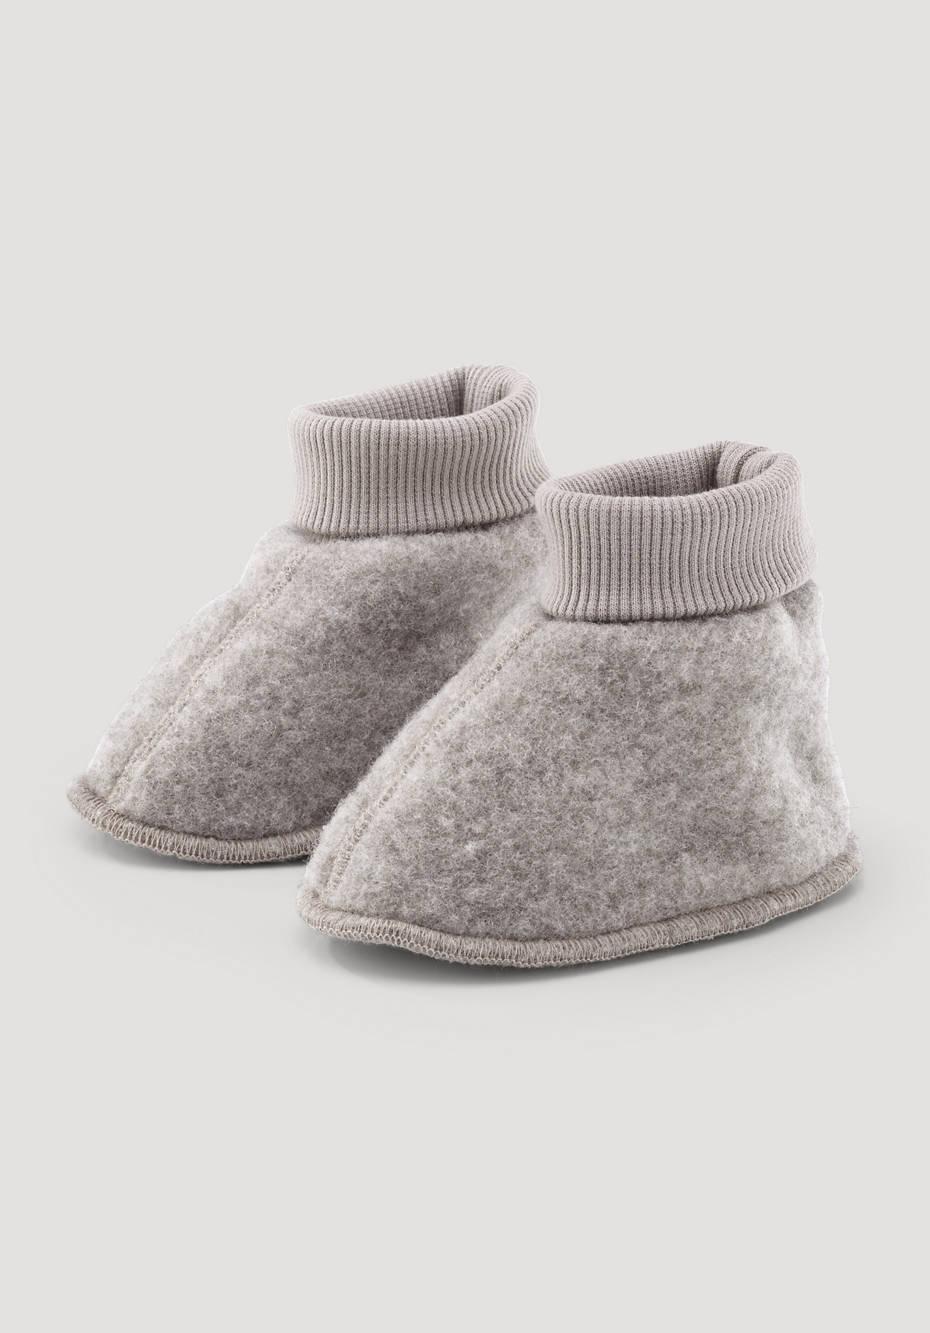 Wool fleece shoes made from pure organic merino wool